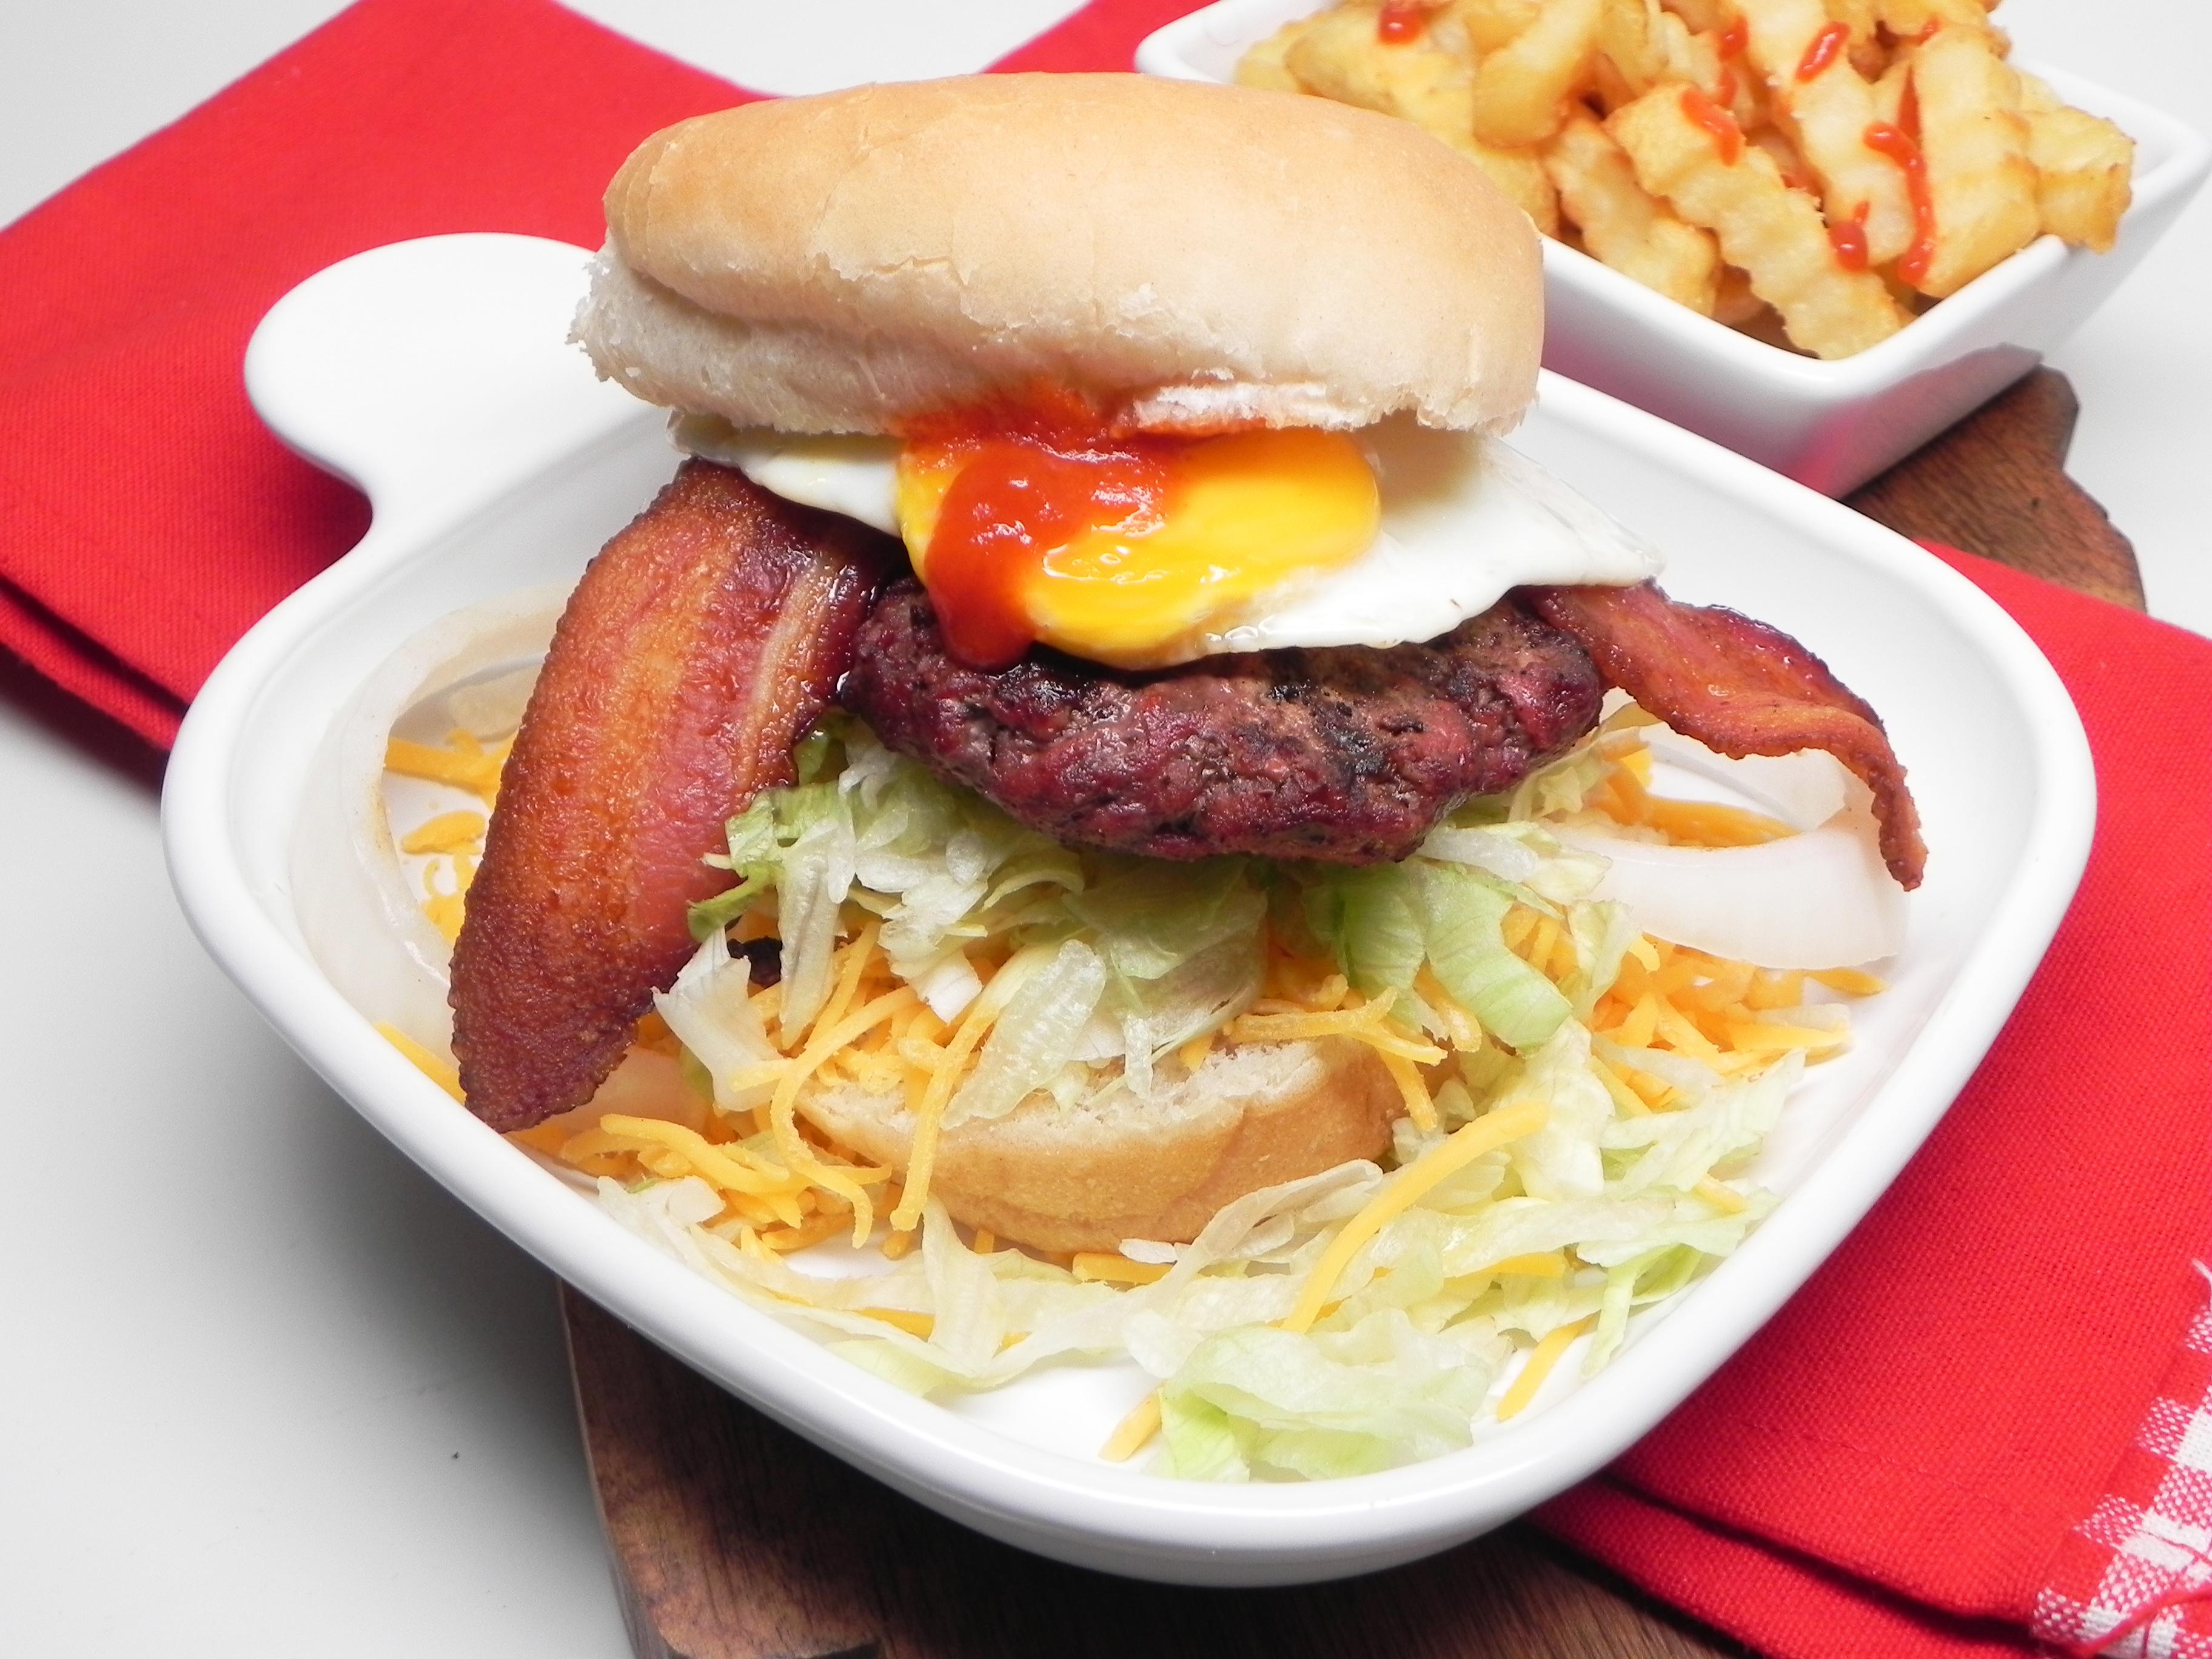 Over-Easy Egg Hamburgers